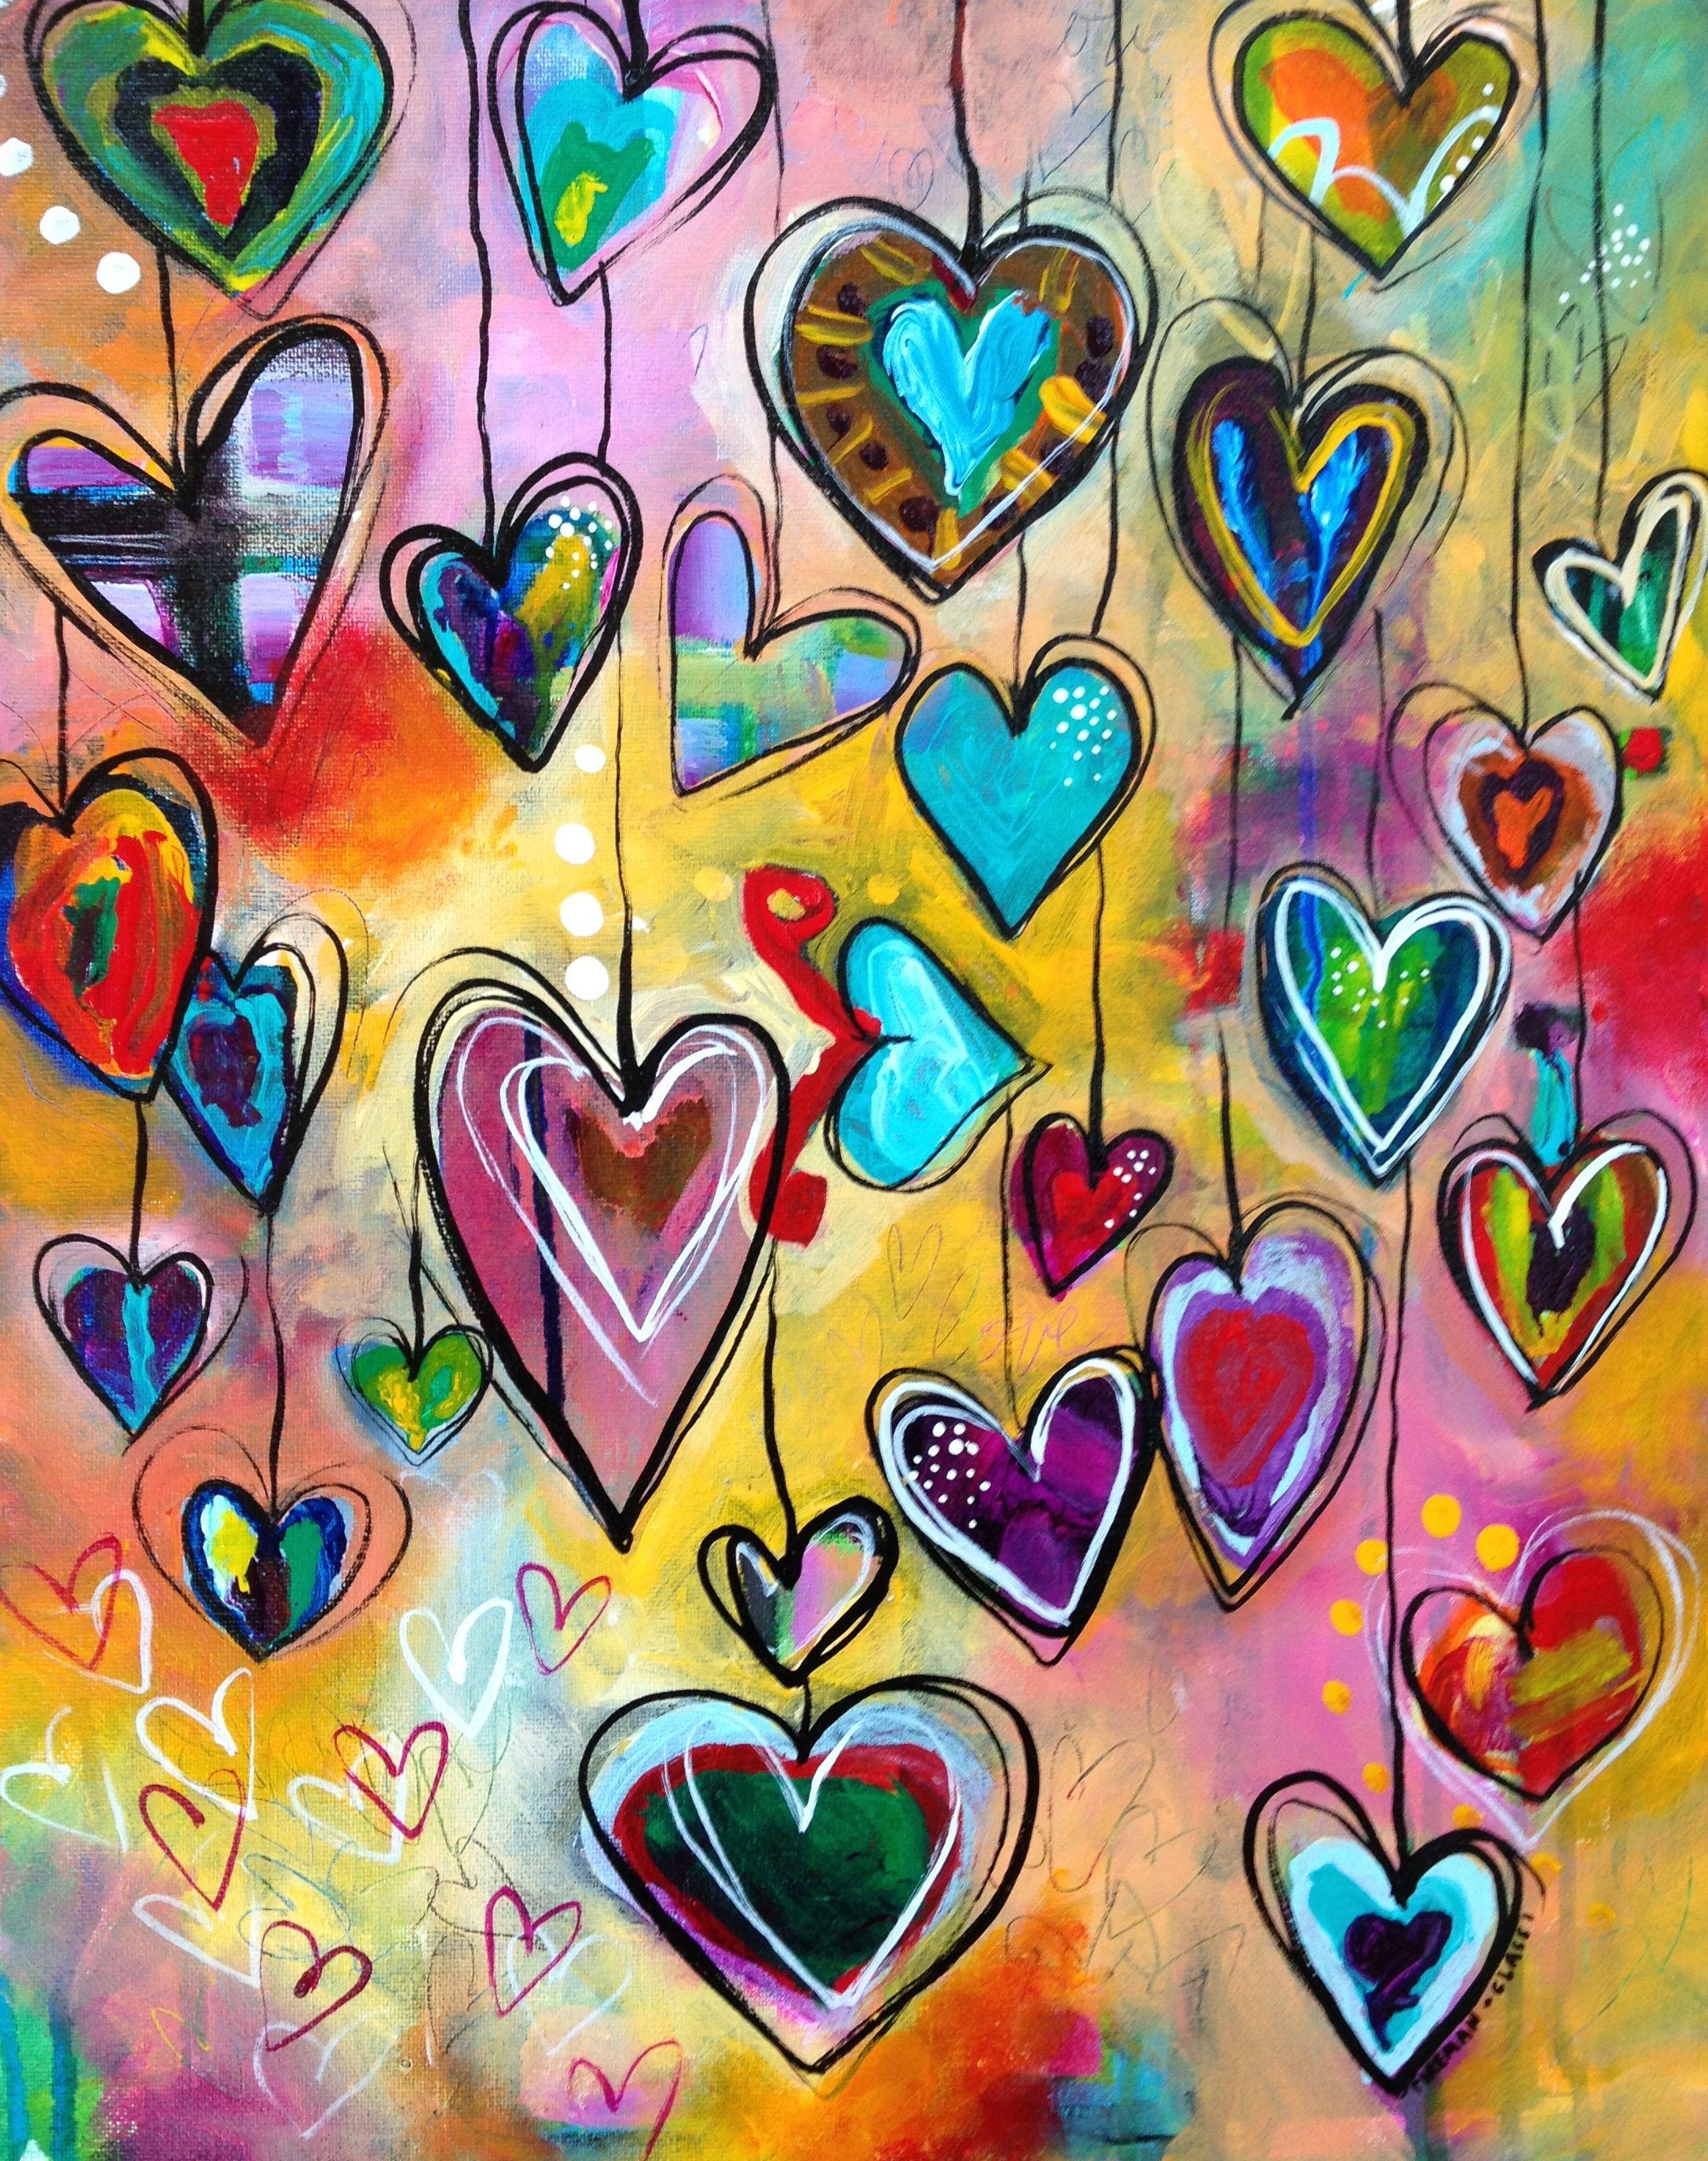 Colorful Hearts | by Belinda Fireman